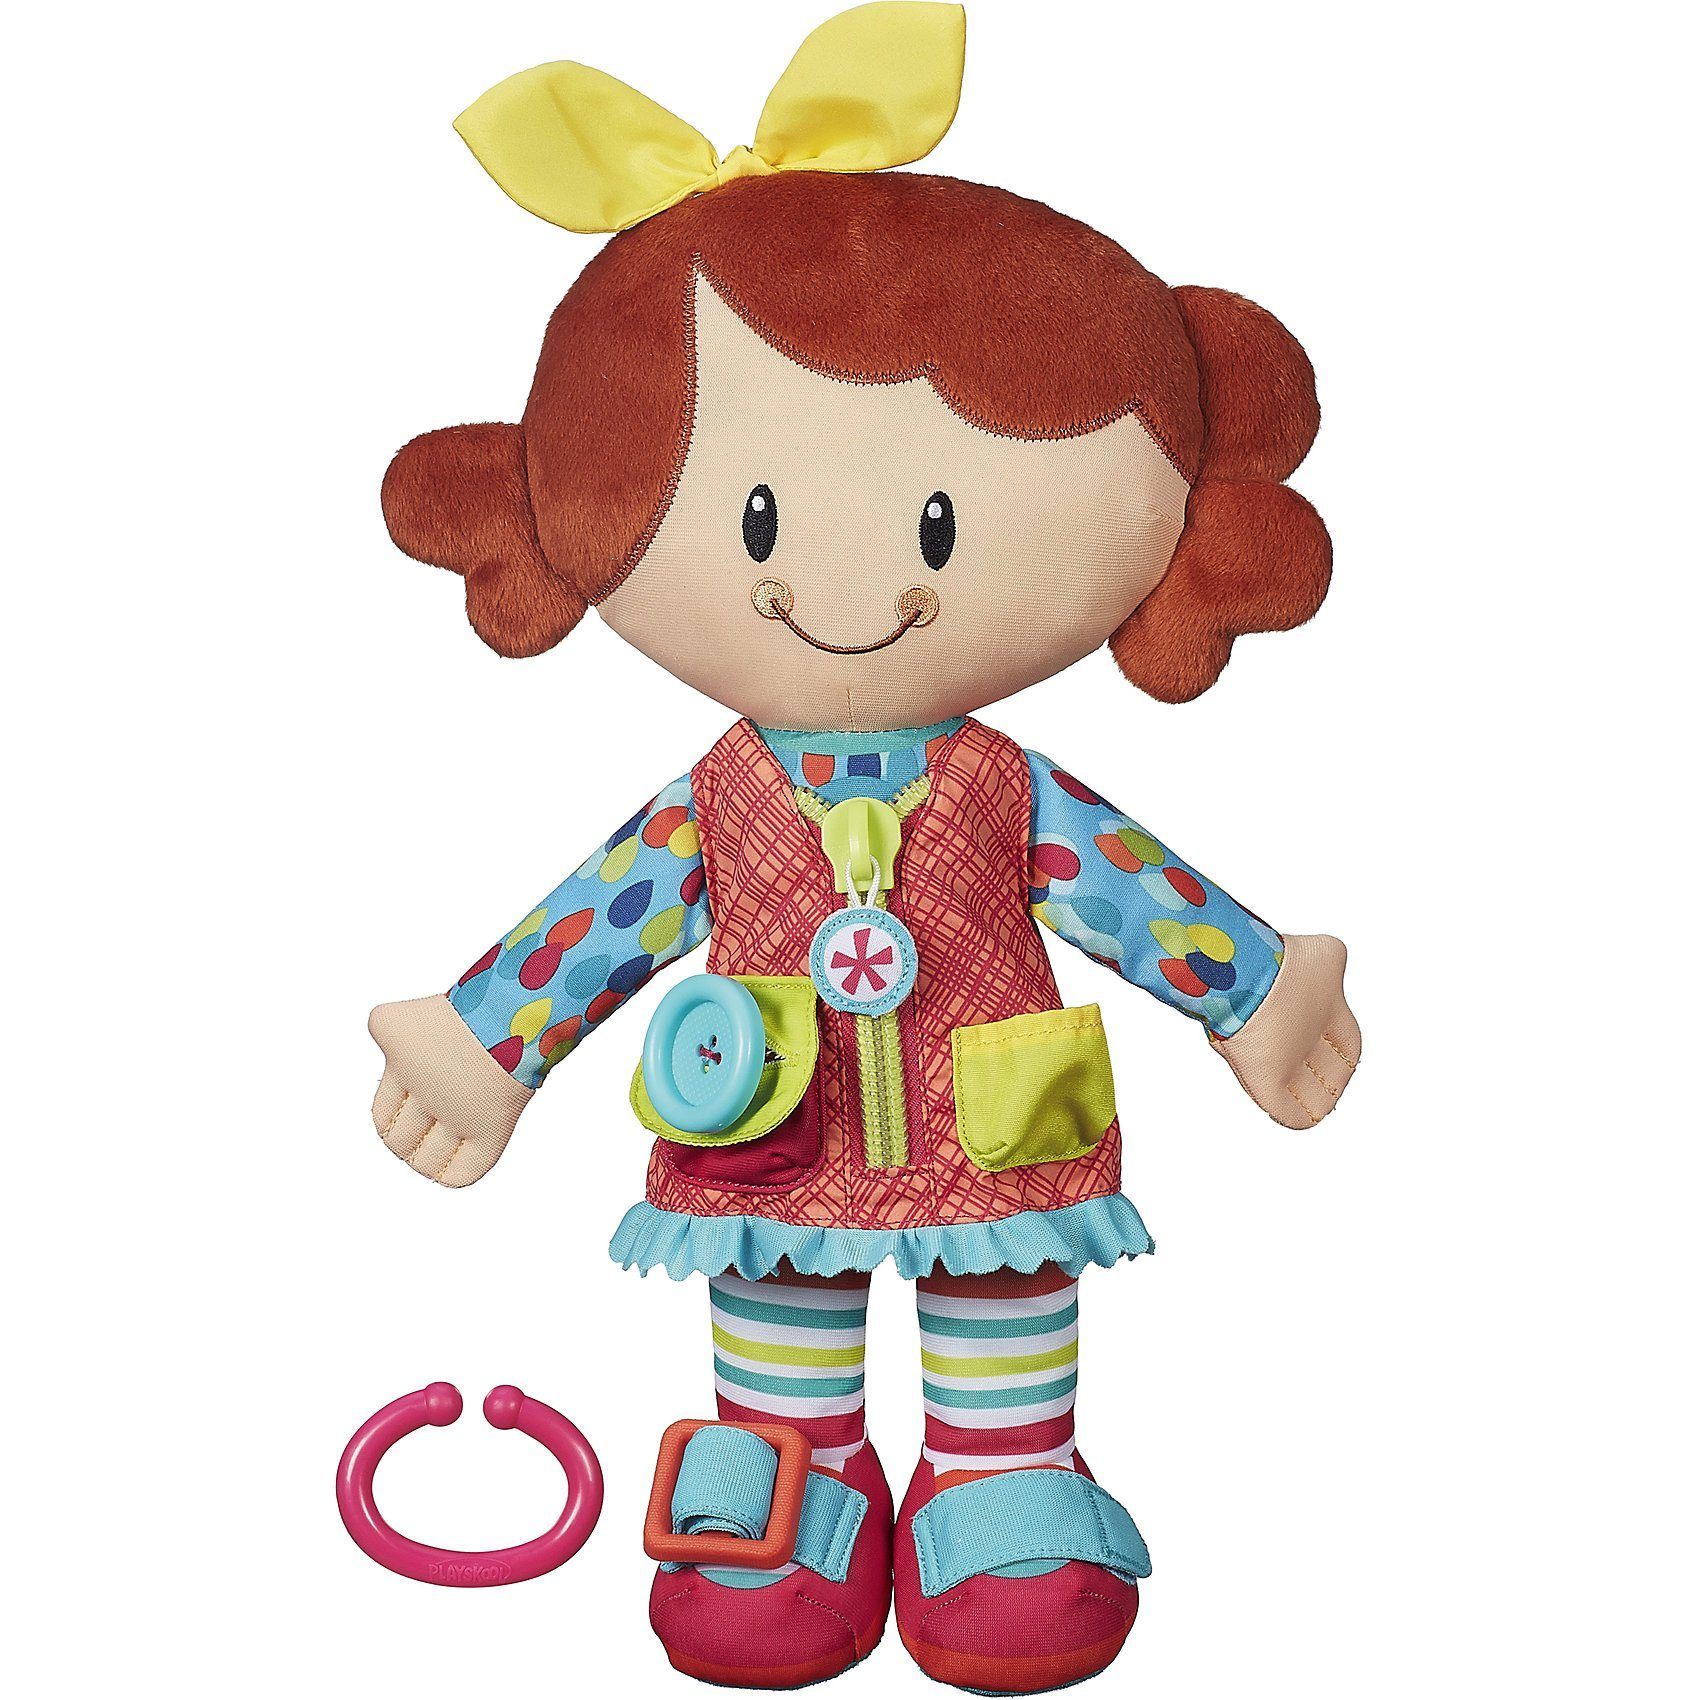 Hasbro Playskool Anziehpuppe Anziehspaß-Freunde, Mädchen